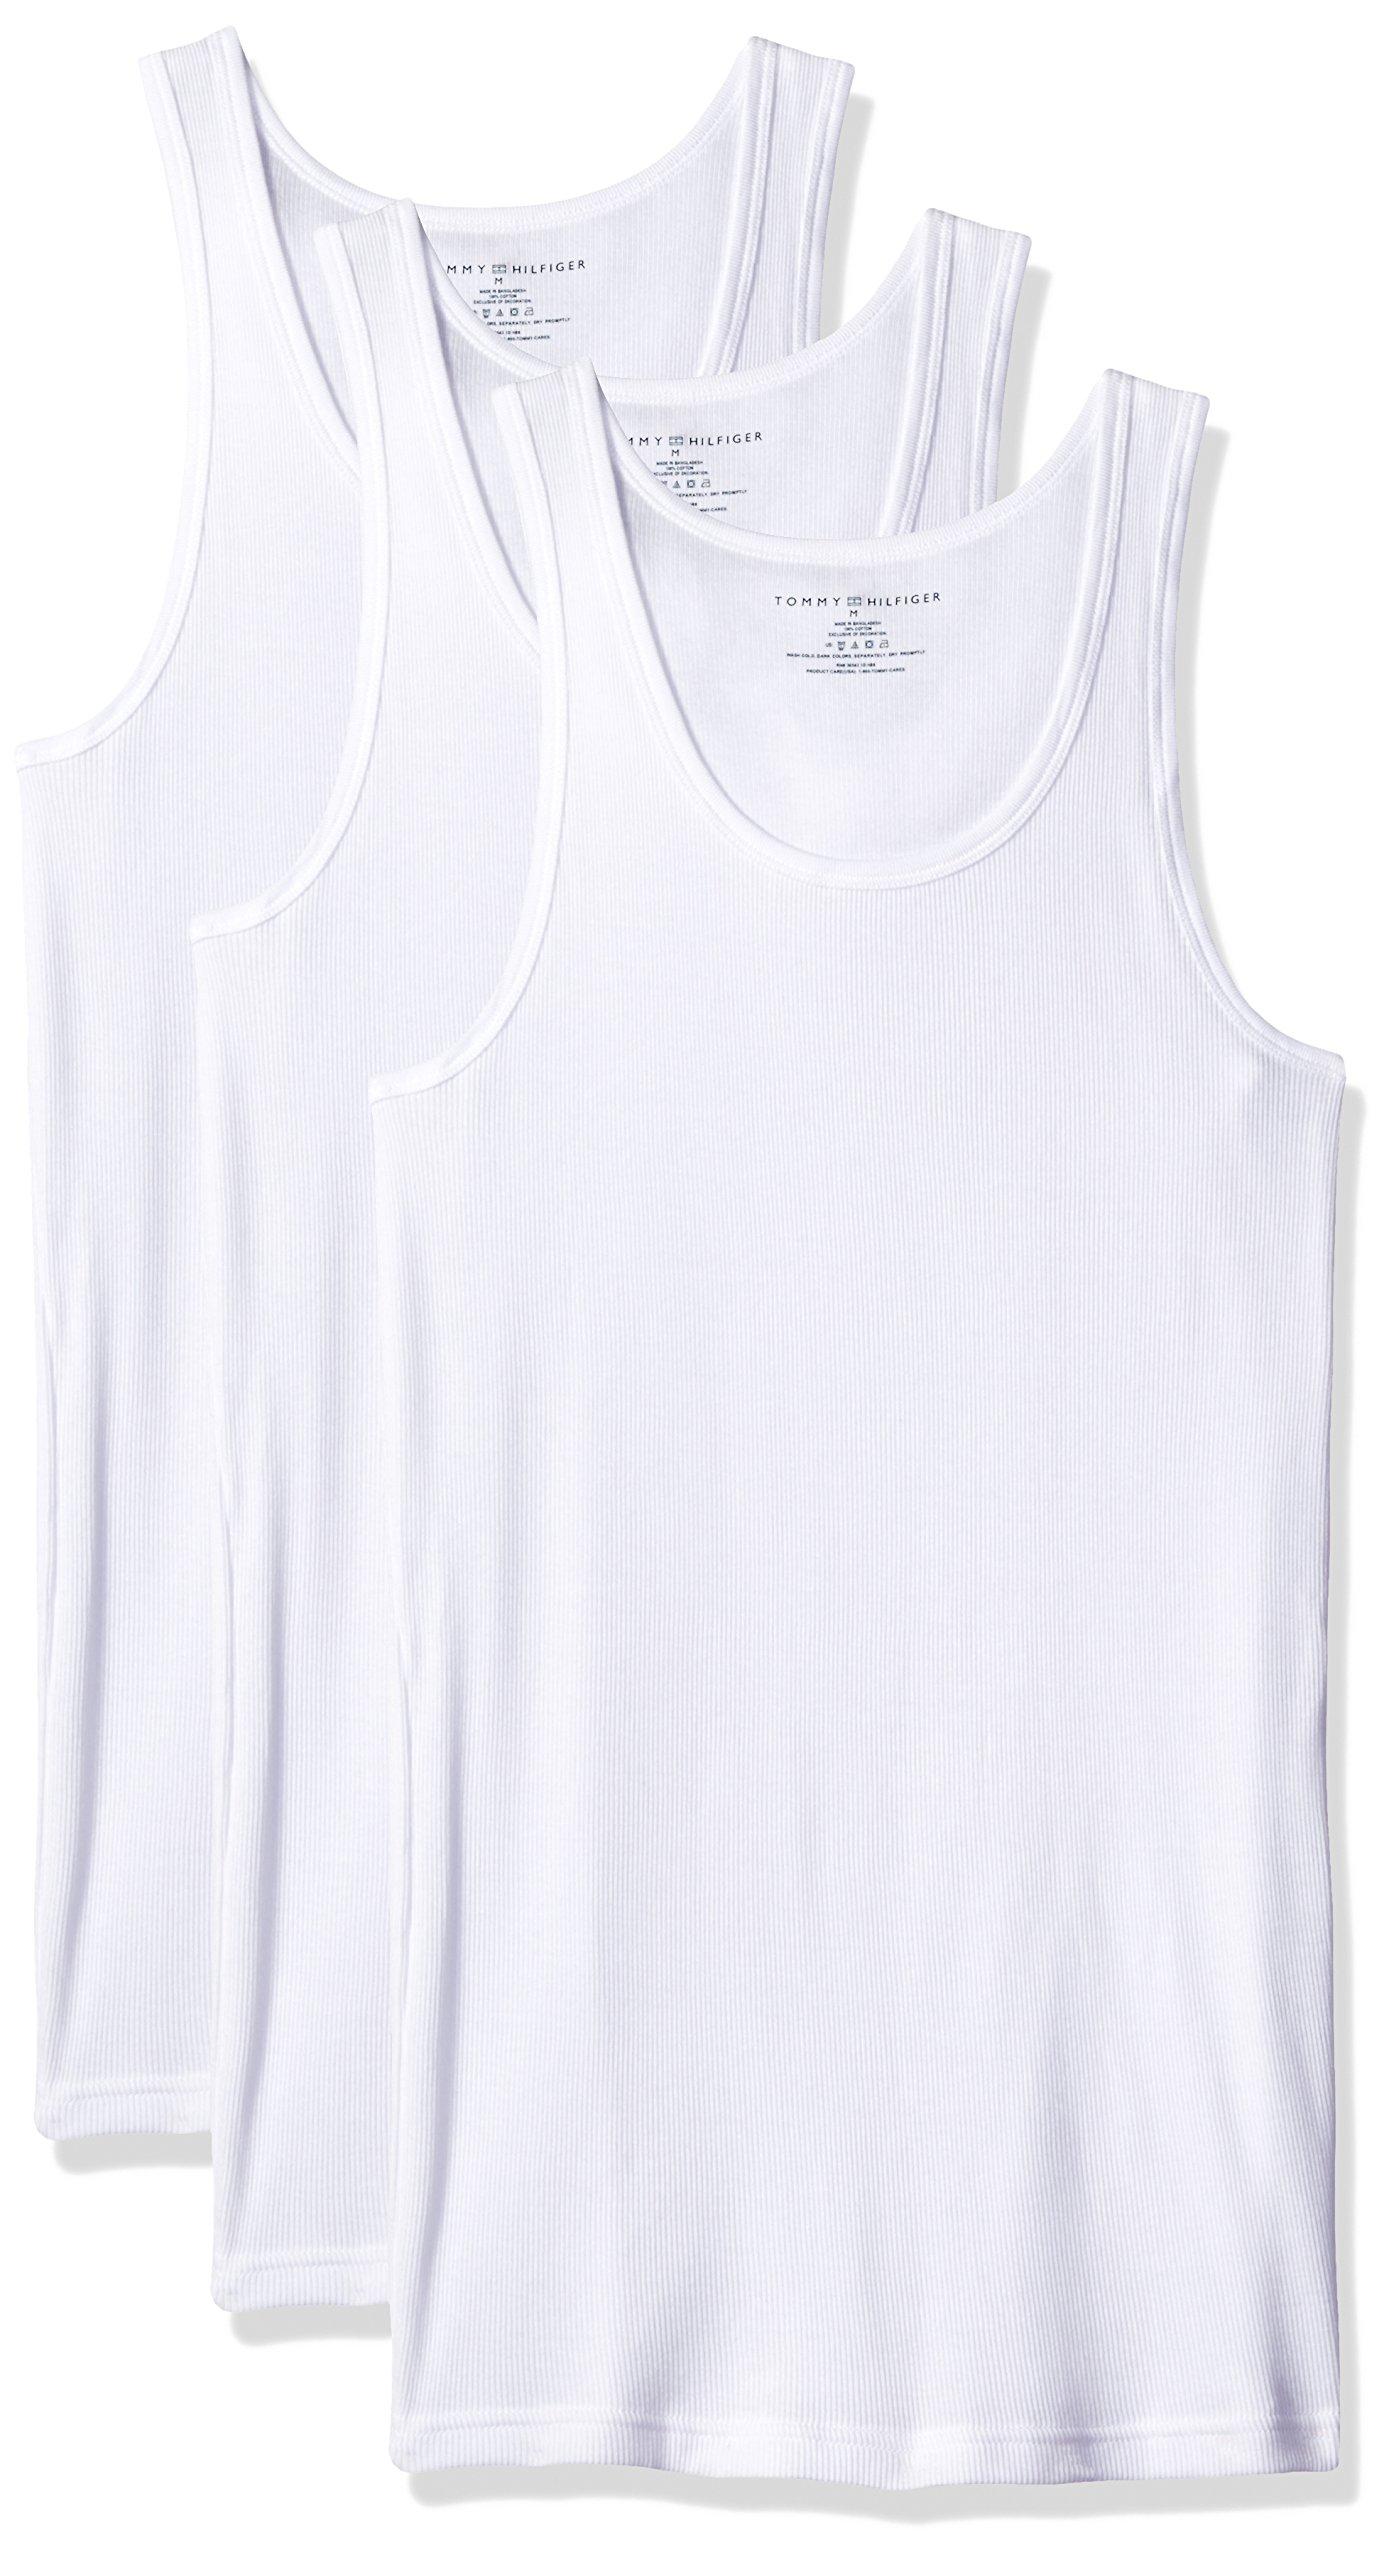 Tommy Hilfiger Men's Undershirts 3 Pack Cotton Classics A Shirt, White, Medium by Tommy Hilfiger